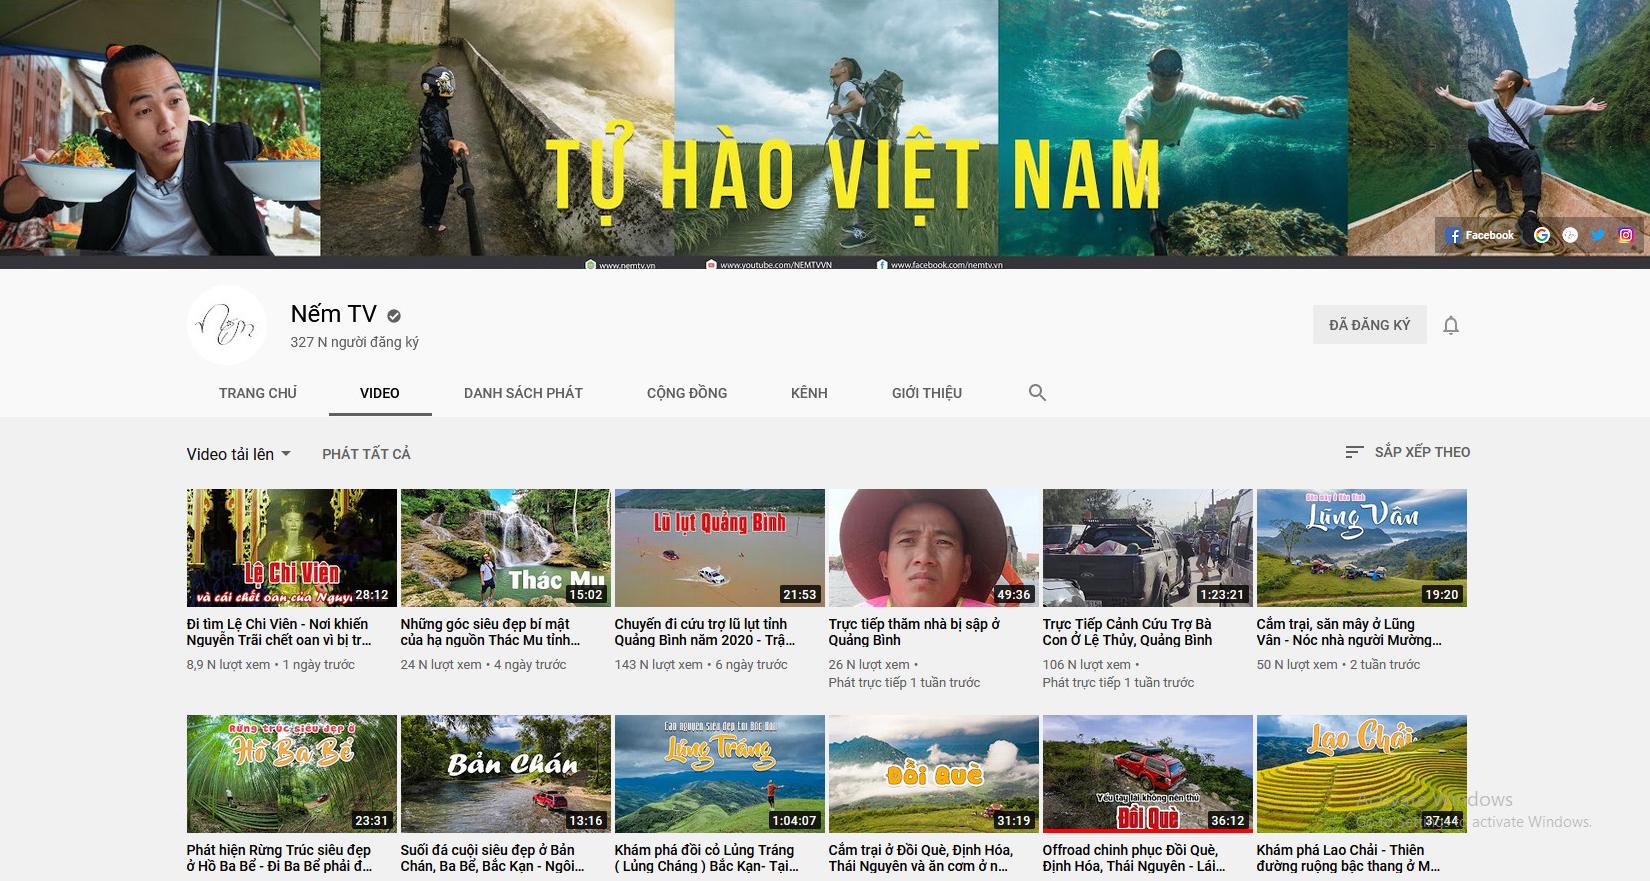 Vlogger Nếm TV